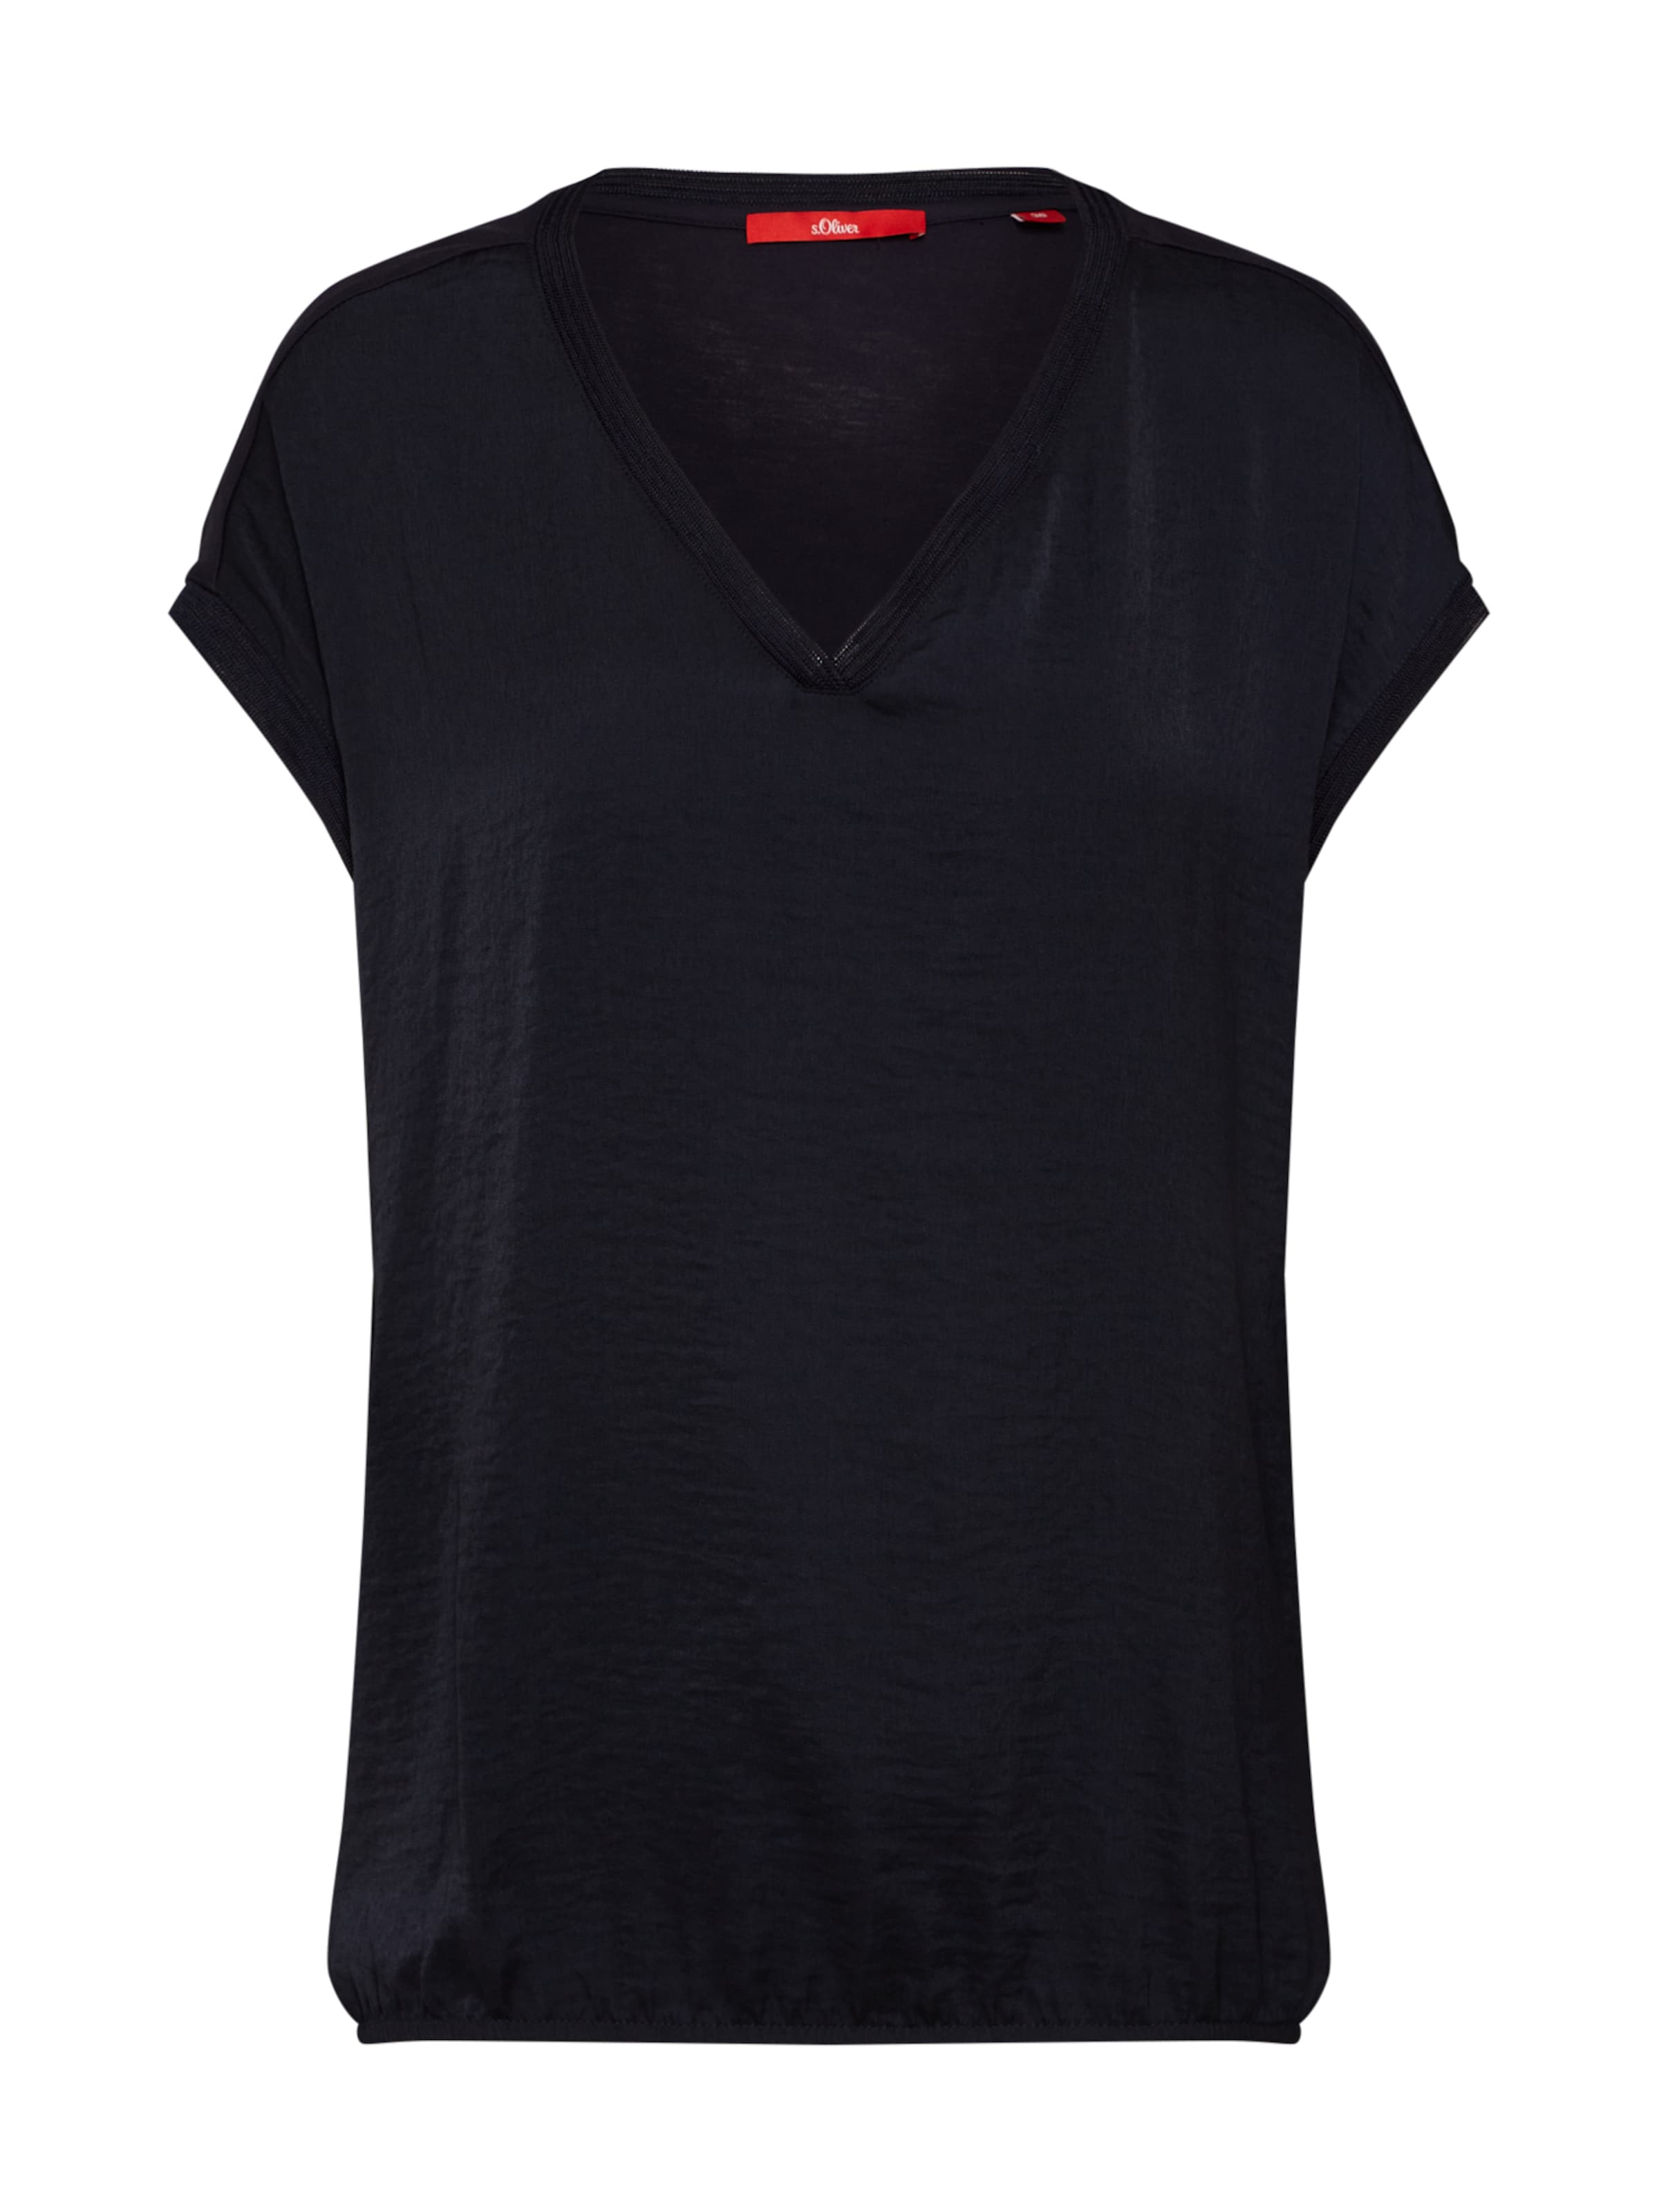 S Red T Label shirt oliver Navy In 5R4ALj